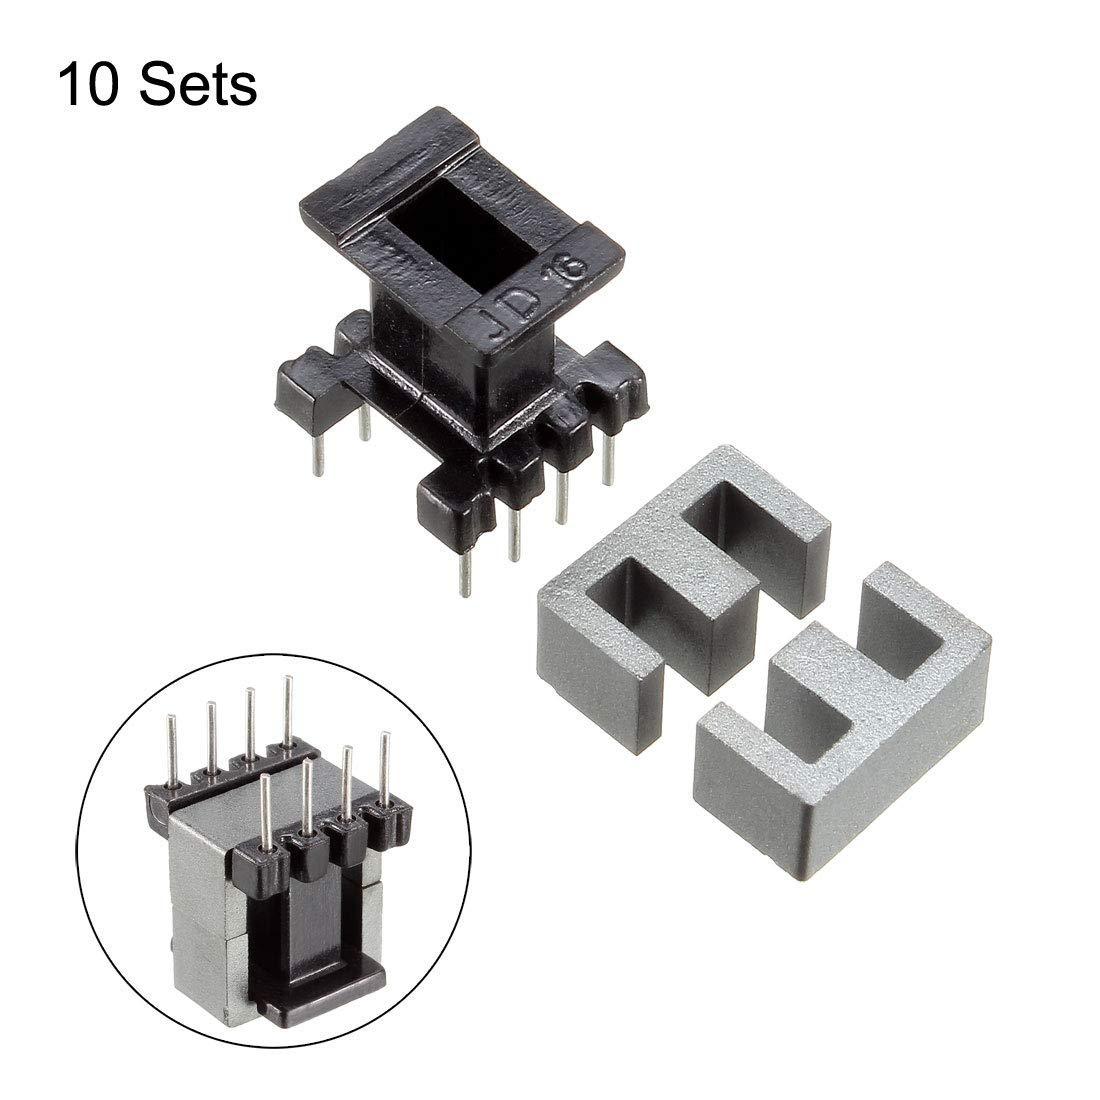 10 Sets EE10 4 with 4pin Transformer Bobbin PC40 Vertical ferrite core 20 ferrite Halves and 10 Coil